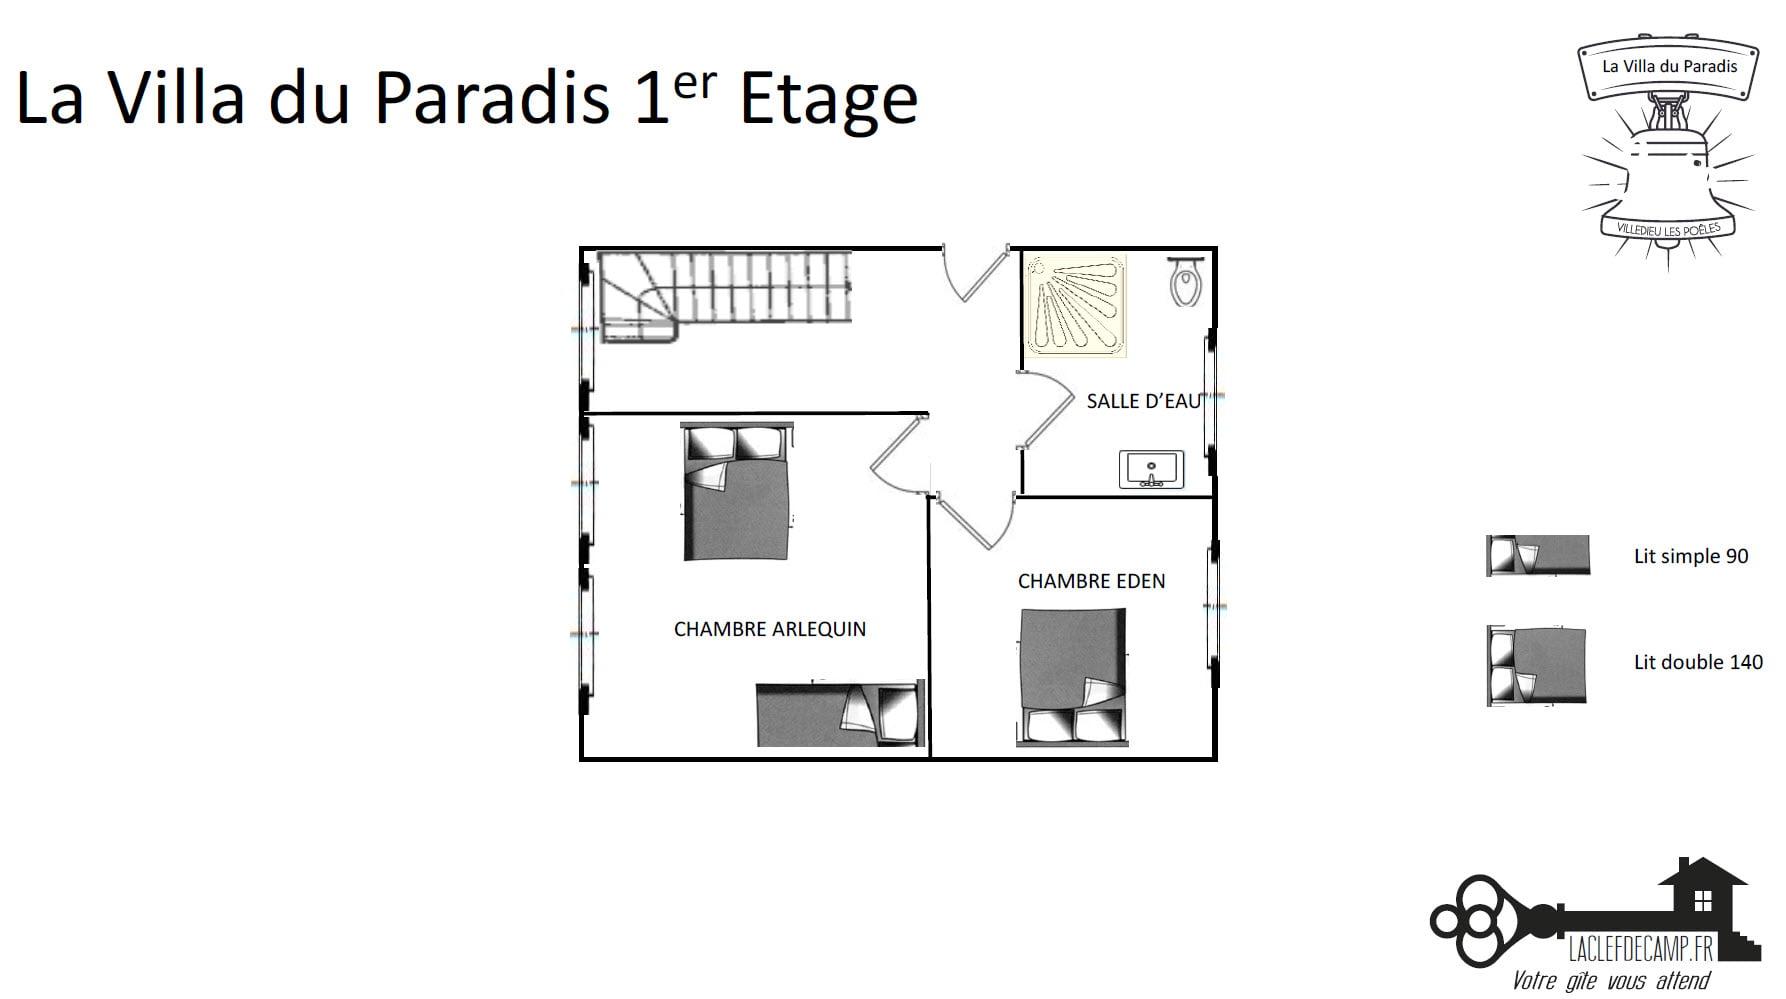 La Villa Du Paradis Villa du paradis 1er